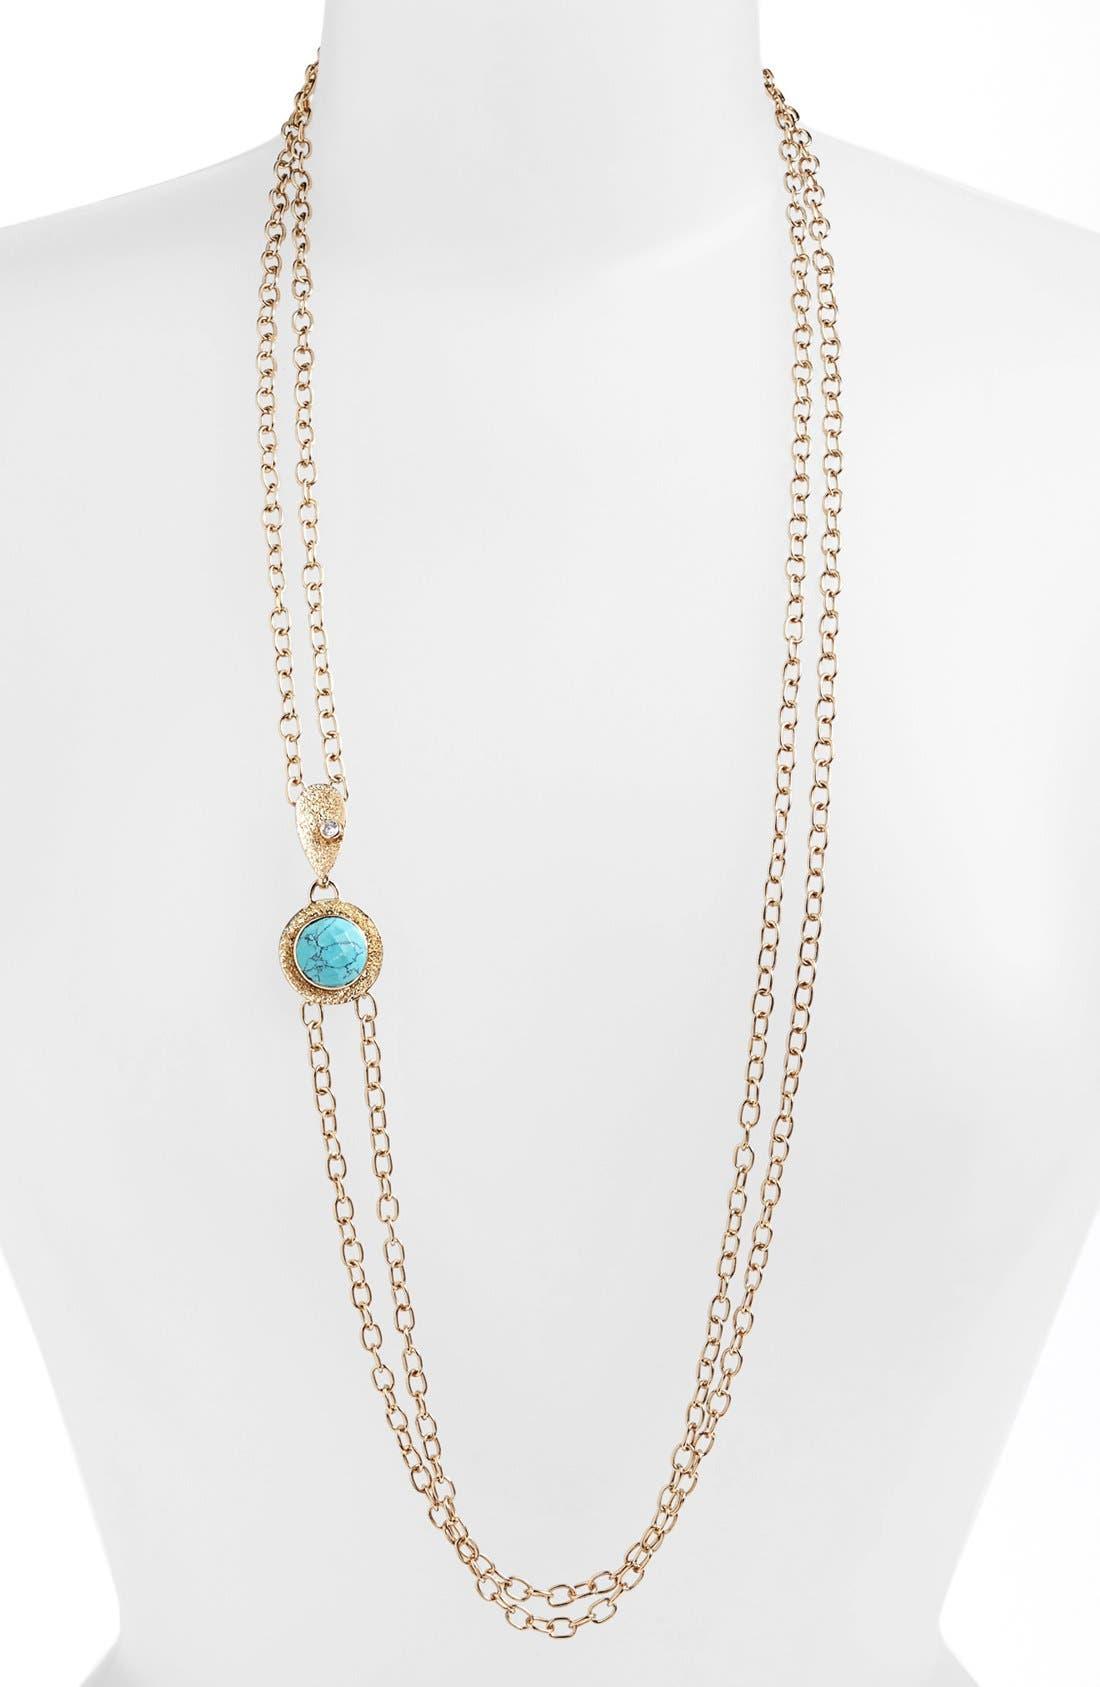 Alternate Image 1 Selected - Melinda Maria 'Sandra' Long Multistrand Necklace (Nordstrom Exclusive)